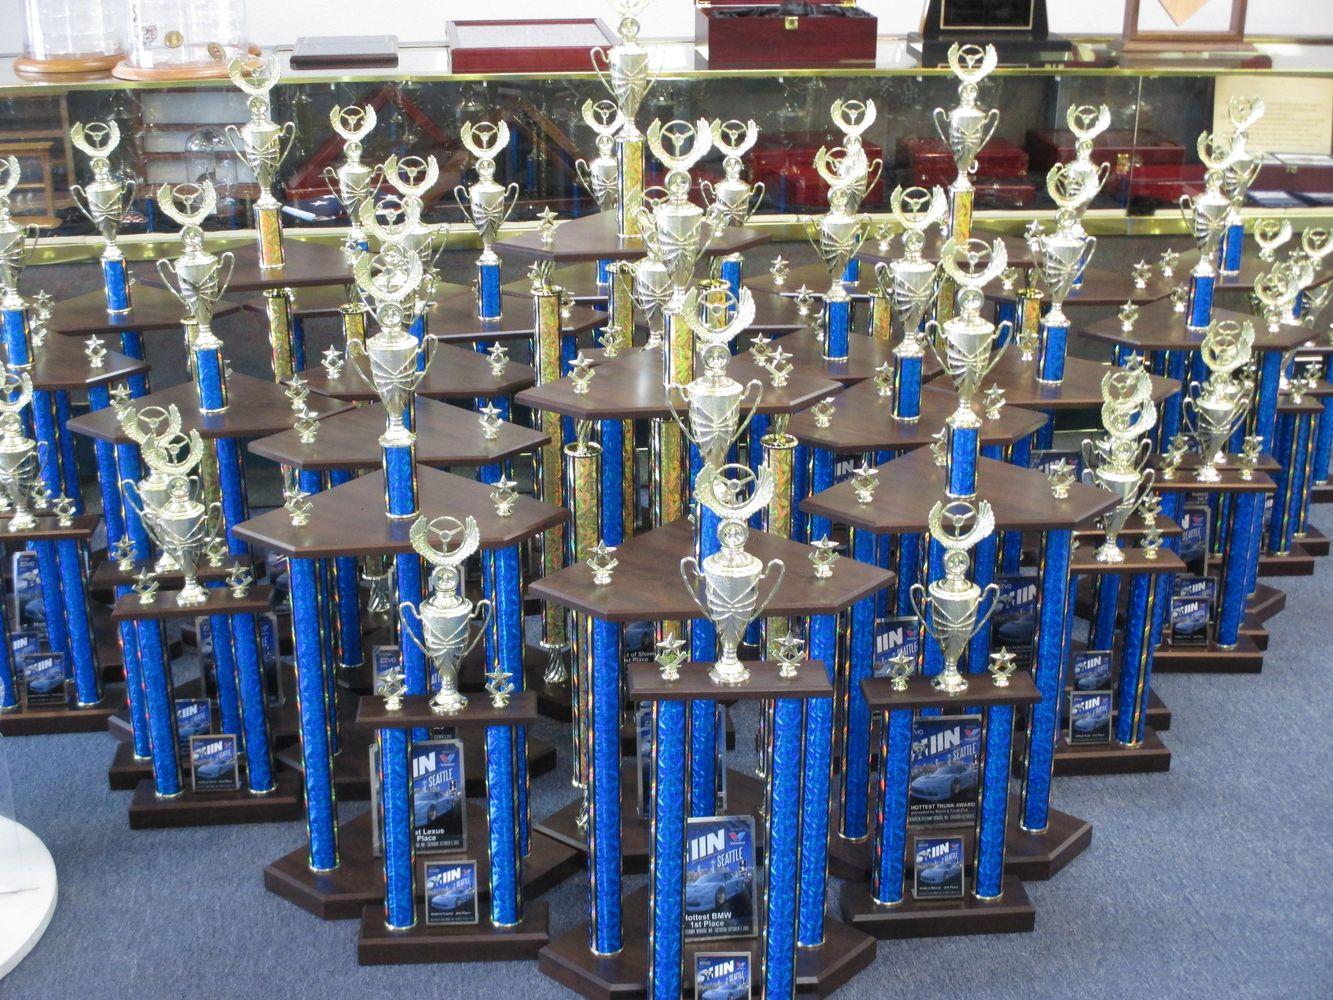 tacoma trophy trophy gifts tacoma trophy tacoma trophy trophy gifts tacoma